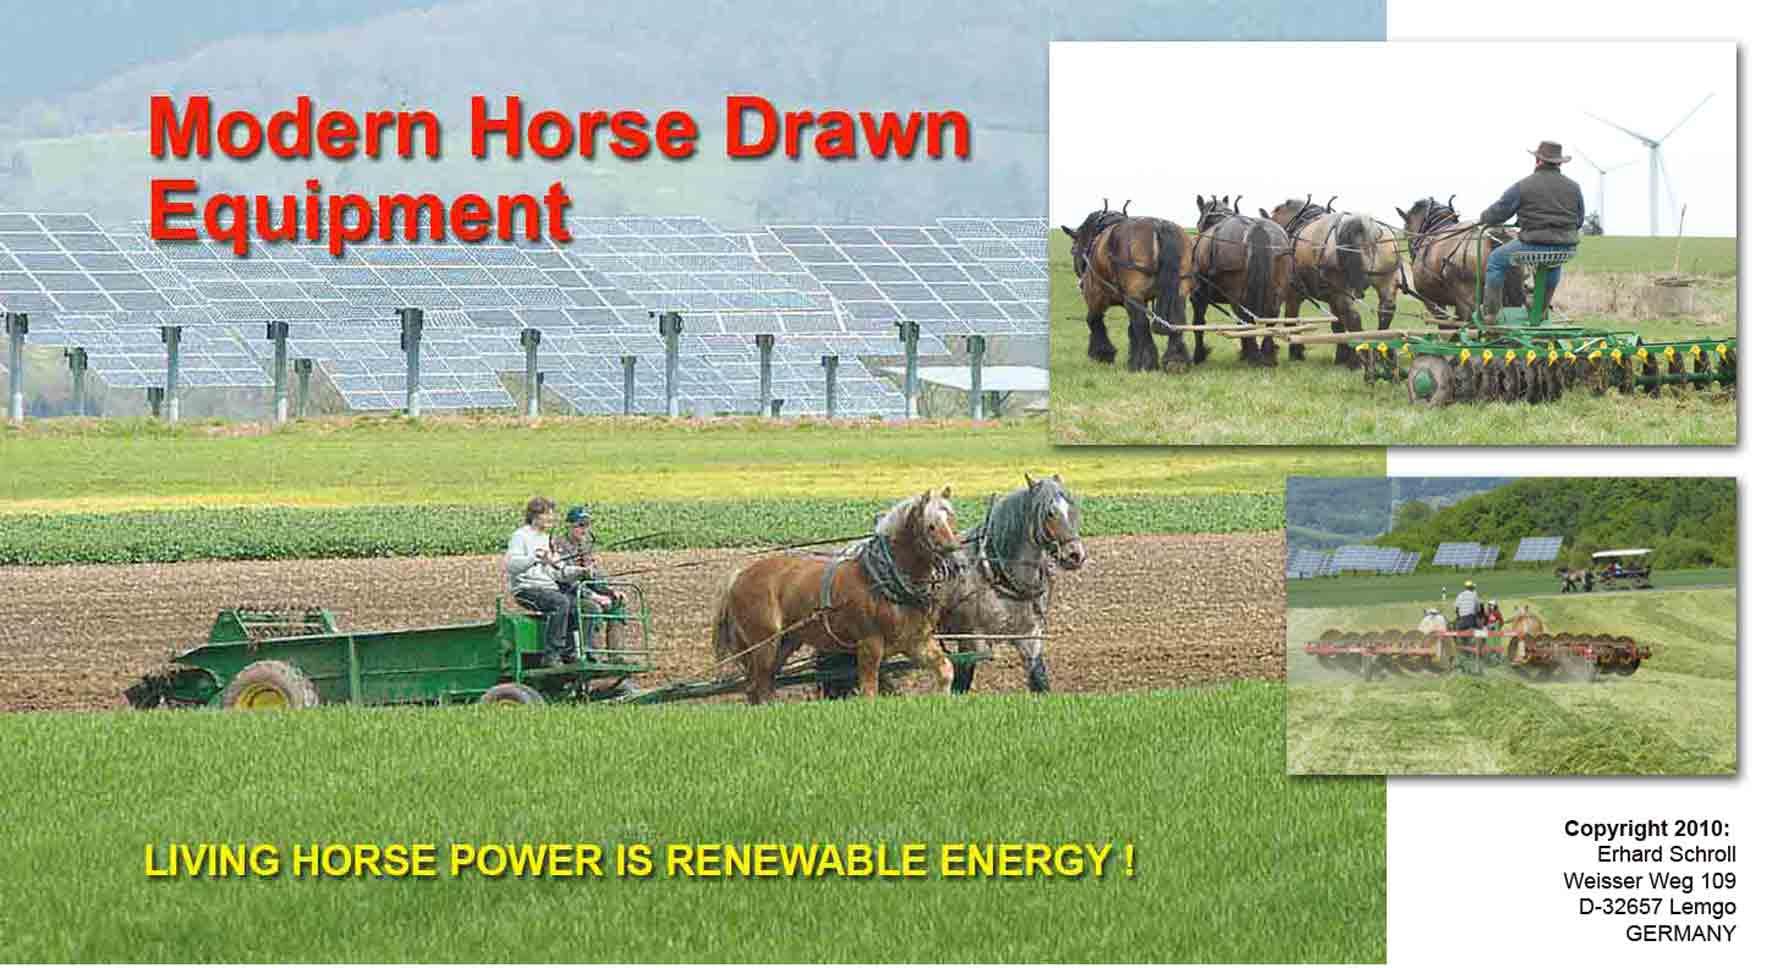 Modern Horse Drawn Equipment